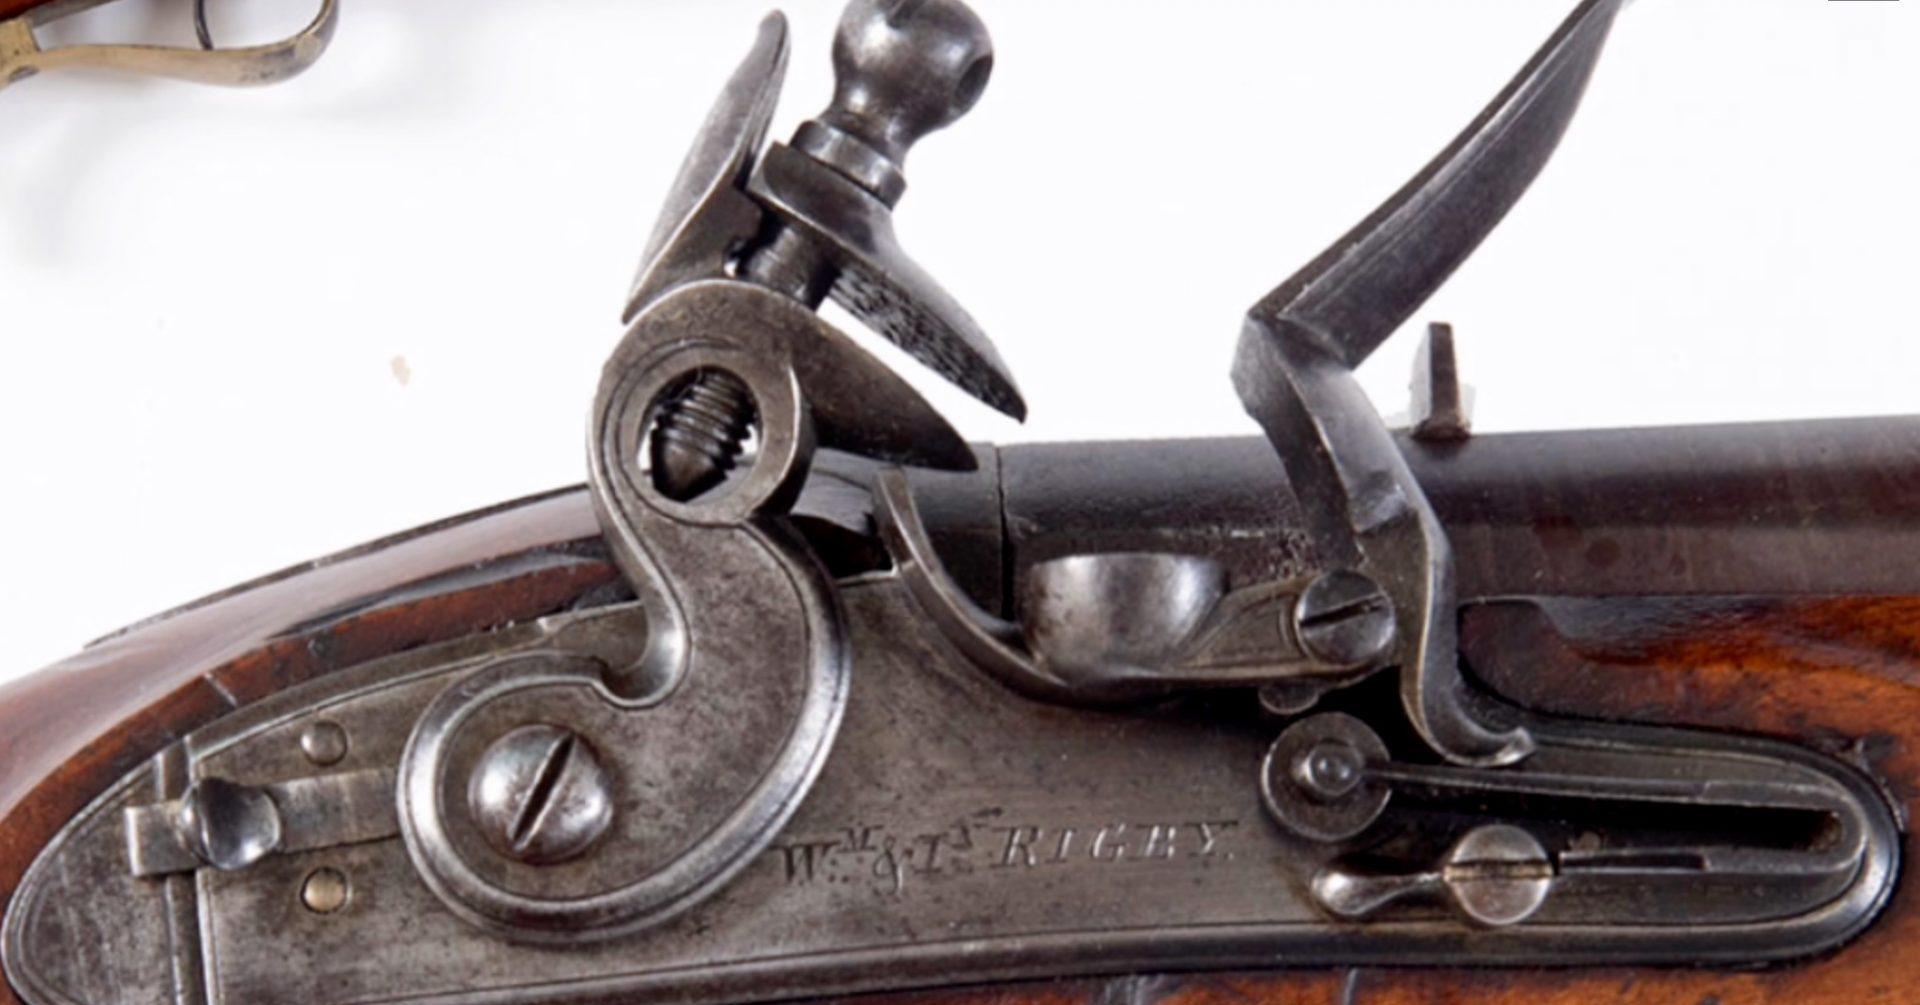 Vintage Arms Association